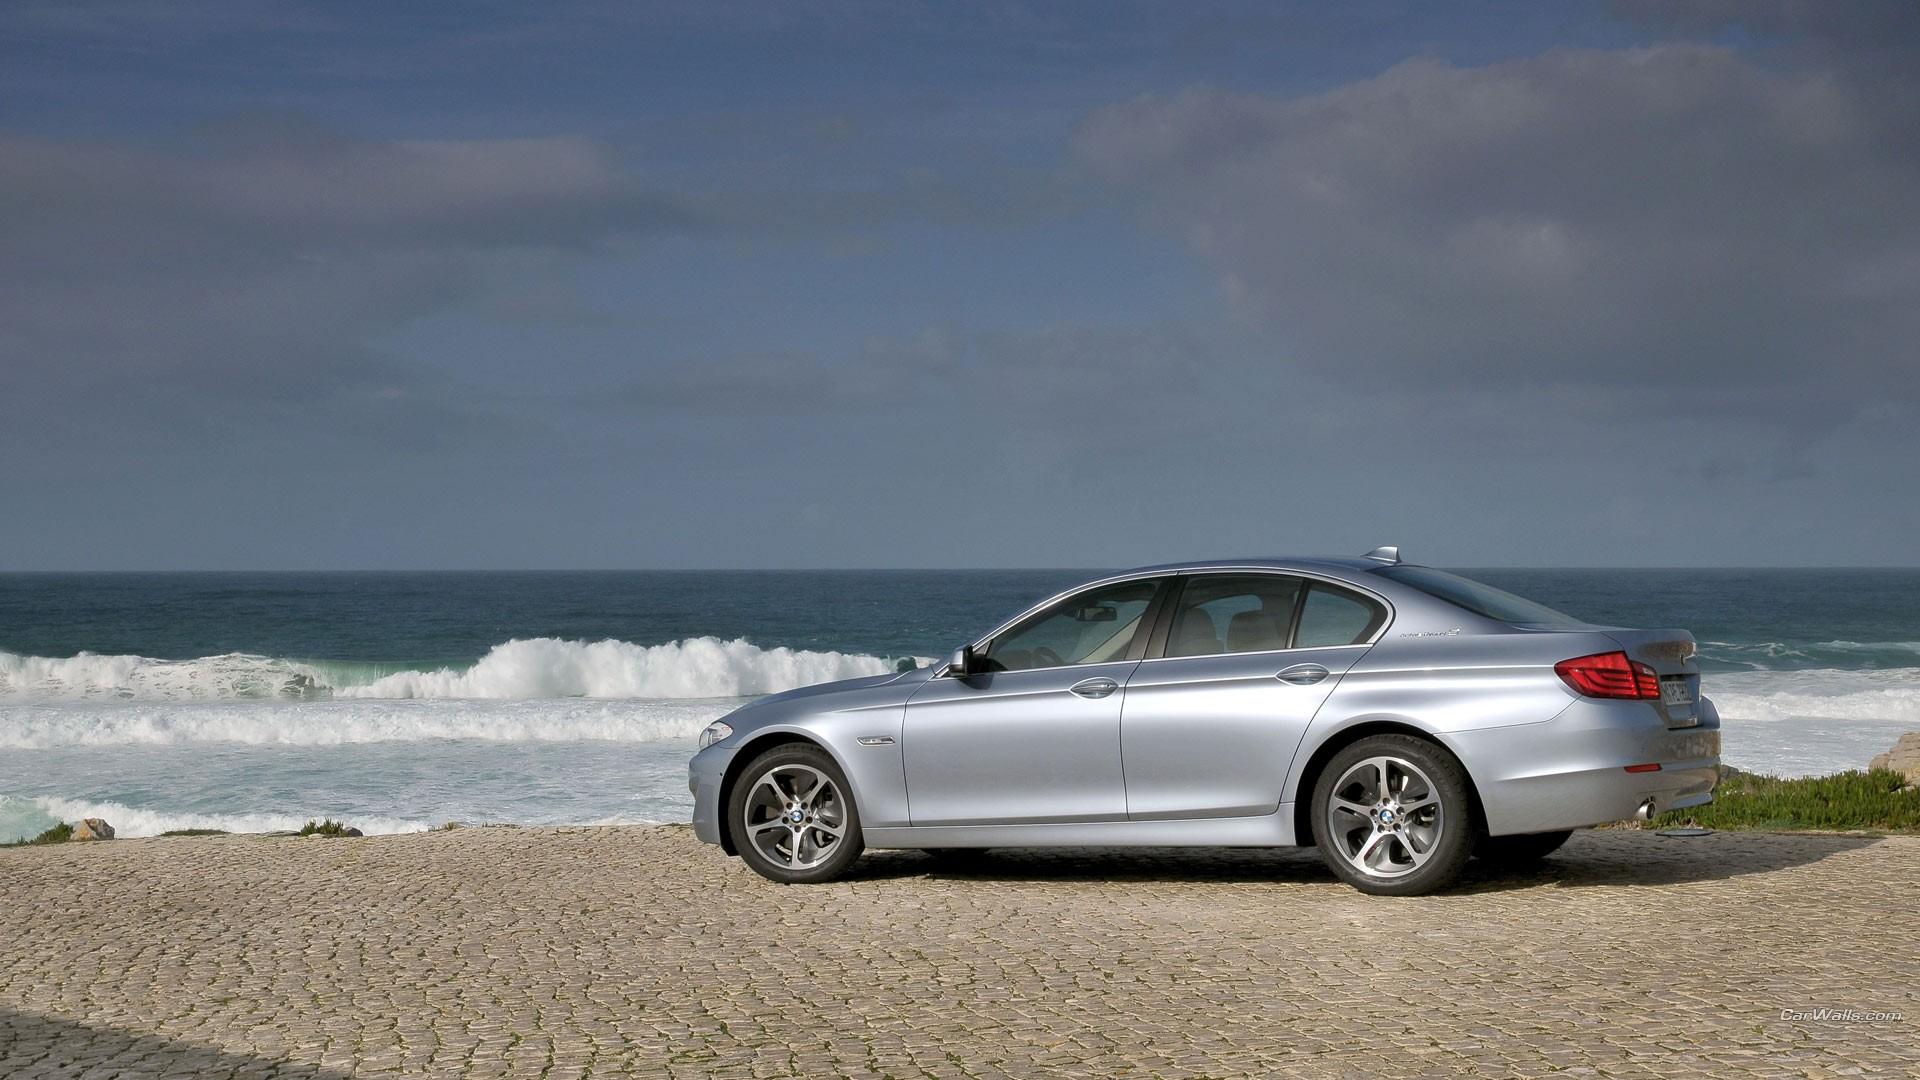 Wallpaper Sea Beach Sports Car Silver Cars Audi A7 Sedan BMW Active Wheel Land Vehicle Automotive Design Exterior Automobile Make